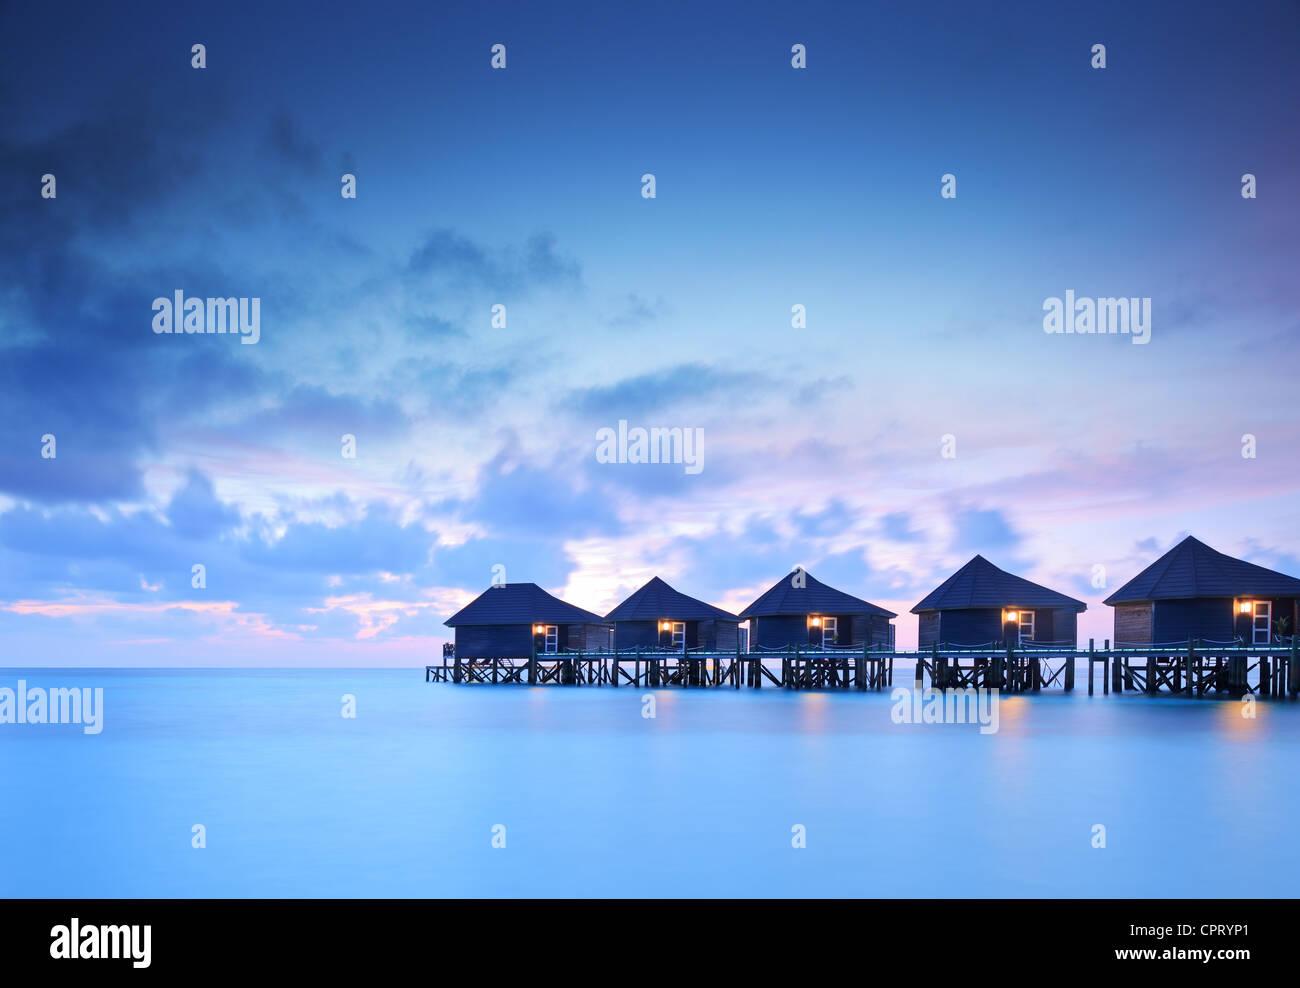 Wasser Villa Ferienhäuser bei Sonnenuntergang auf der Insel Kuredu, Malediven, Lhaviyani atoll Stockbild